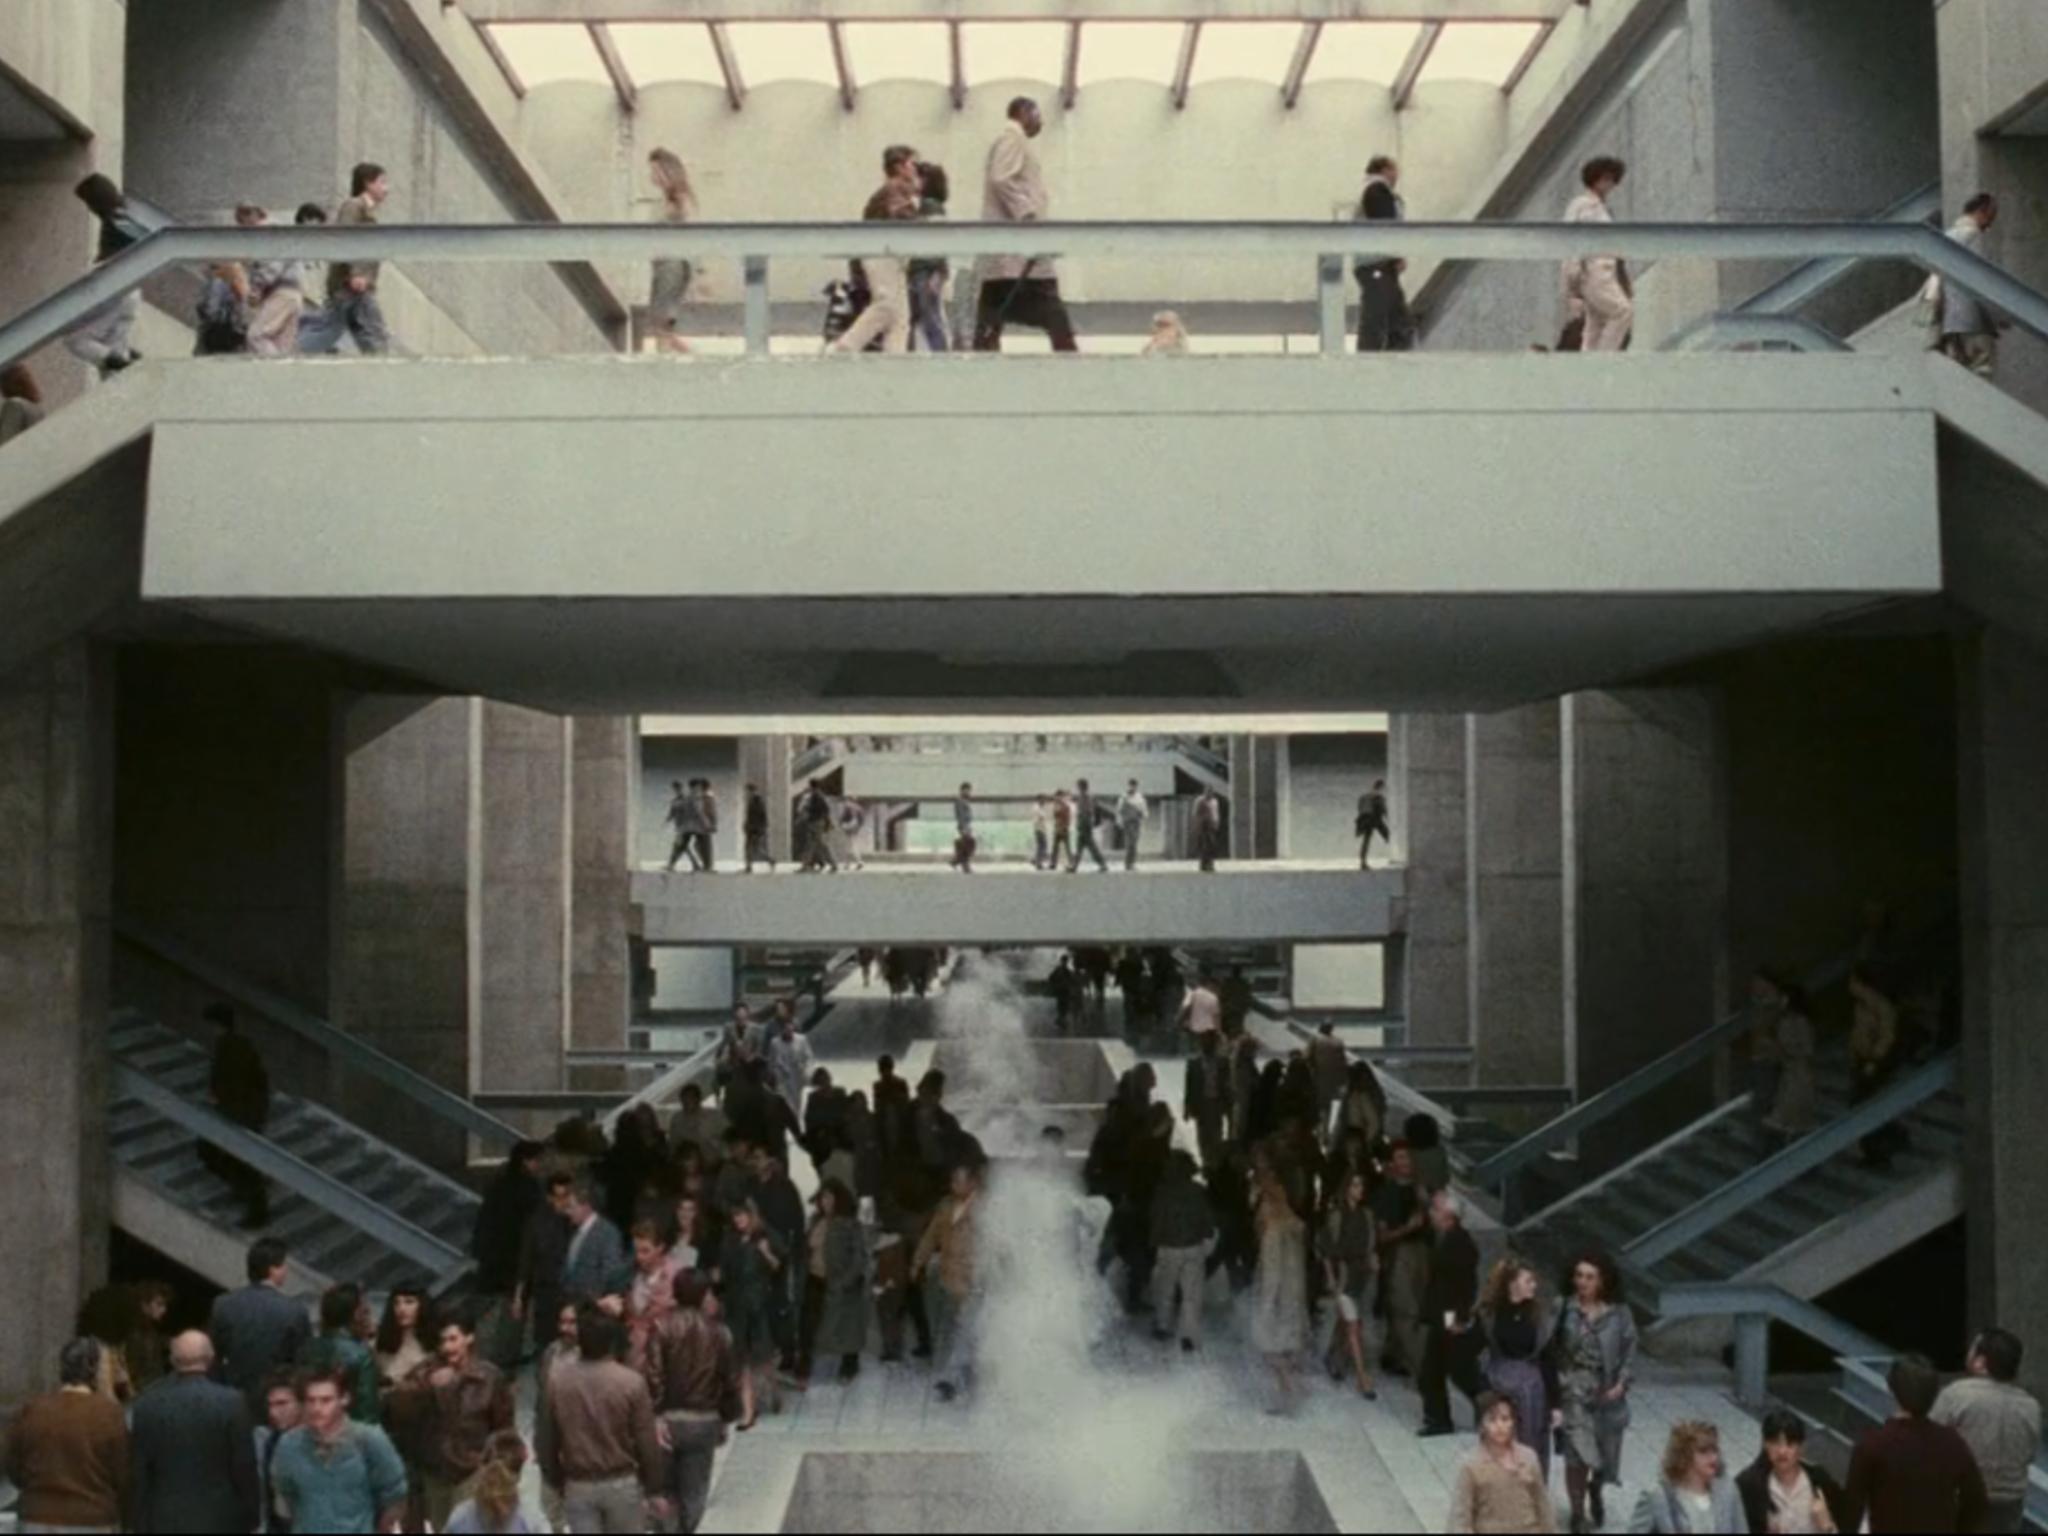 El vengador del futuro, película filmada en la Glorieta de Insurgentes